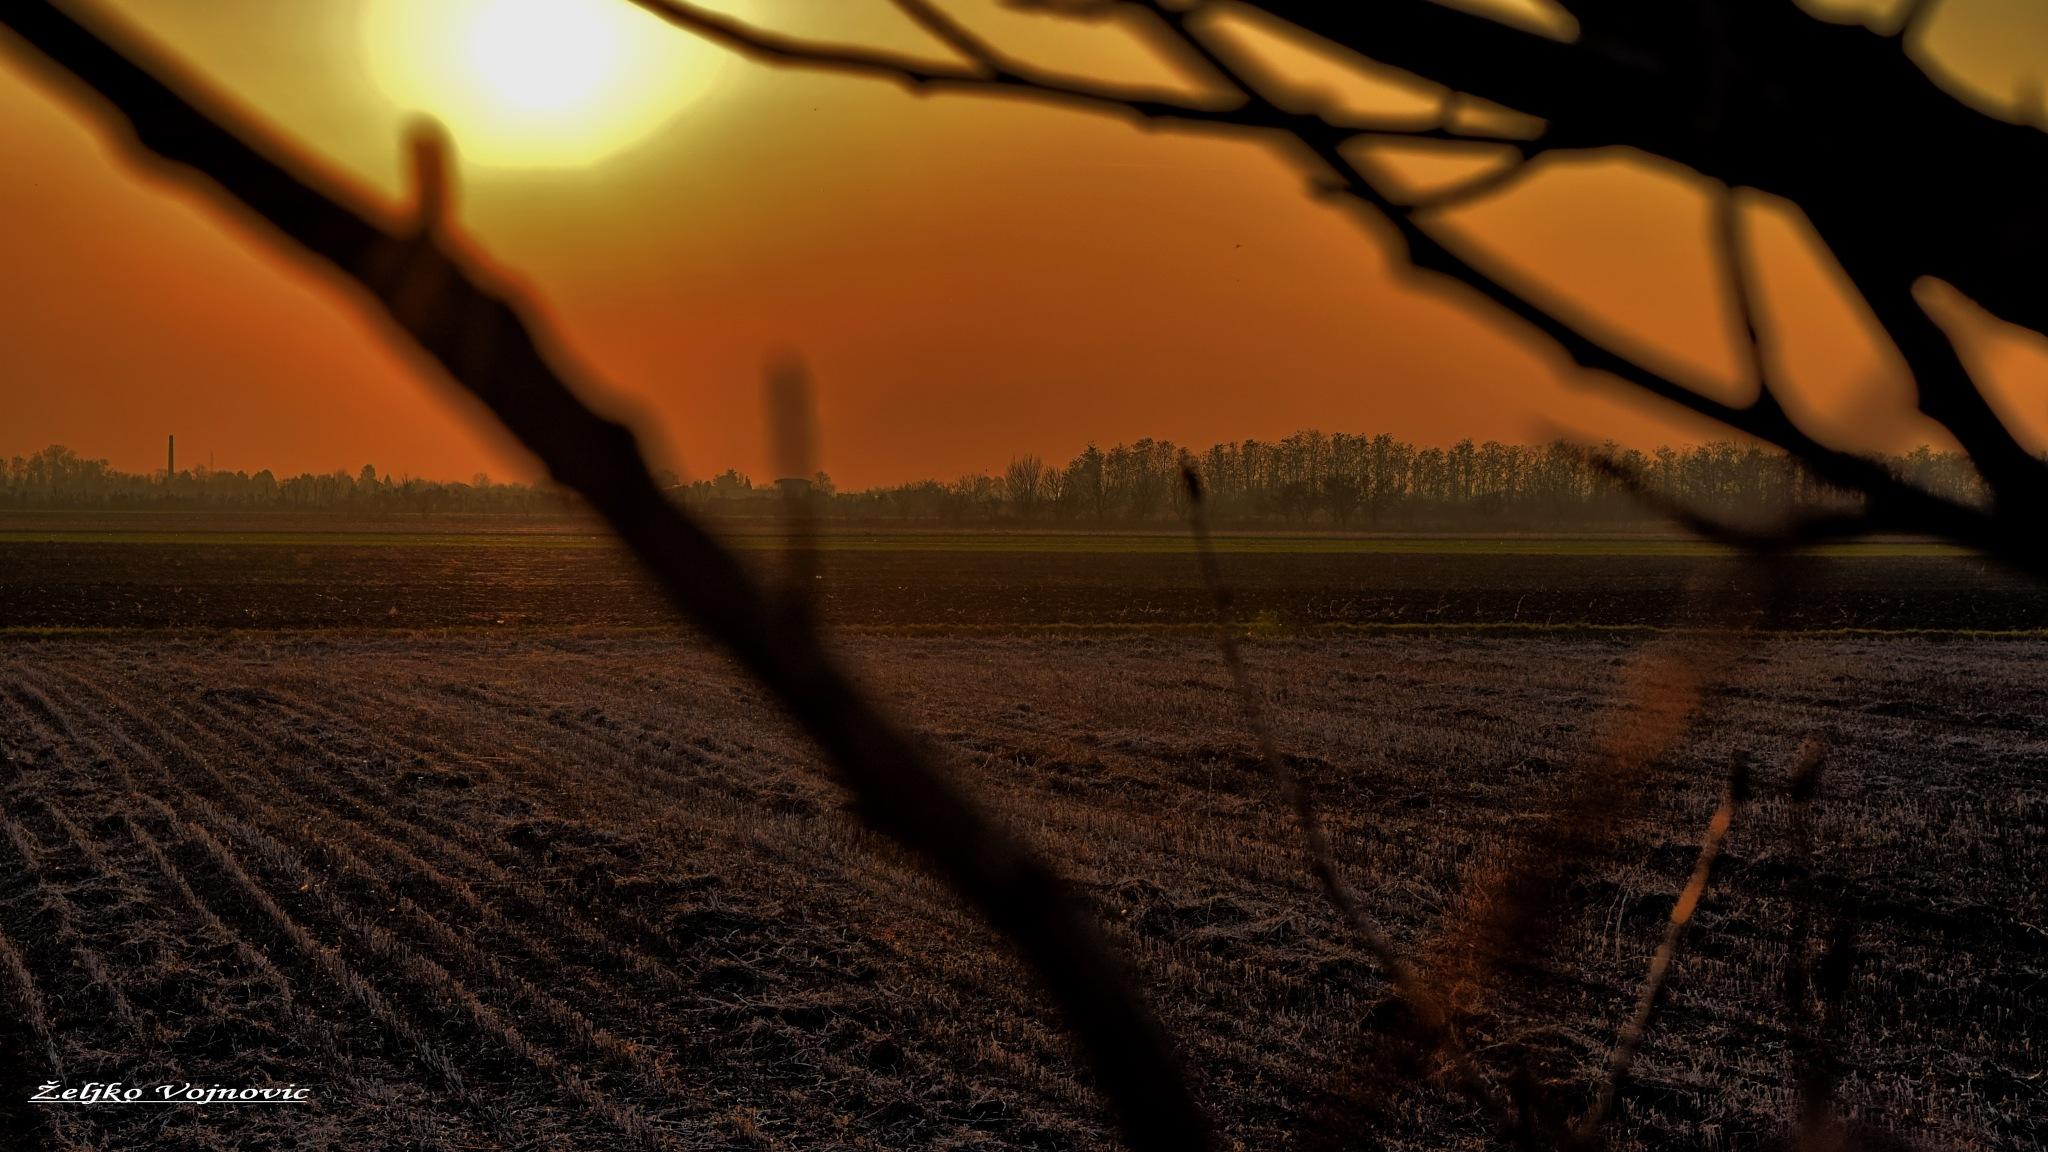 Sunset in the field  by Željko Vojnović